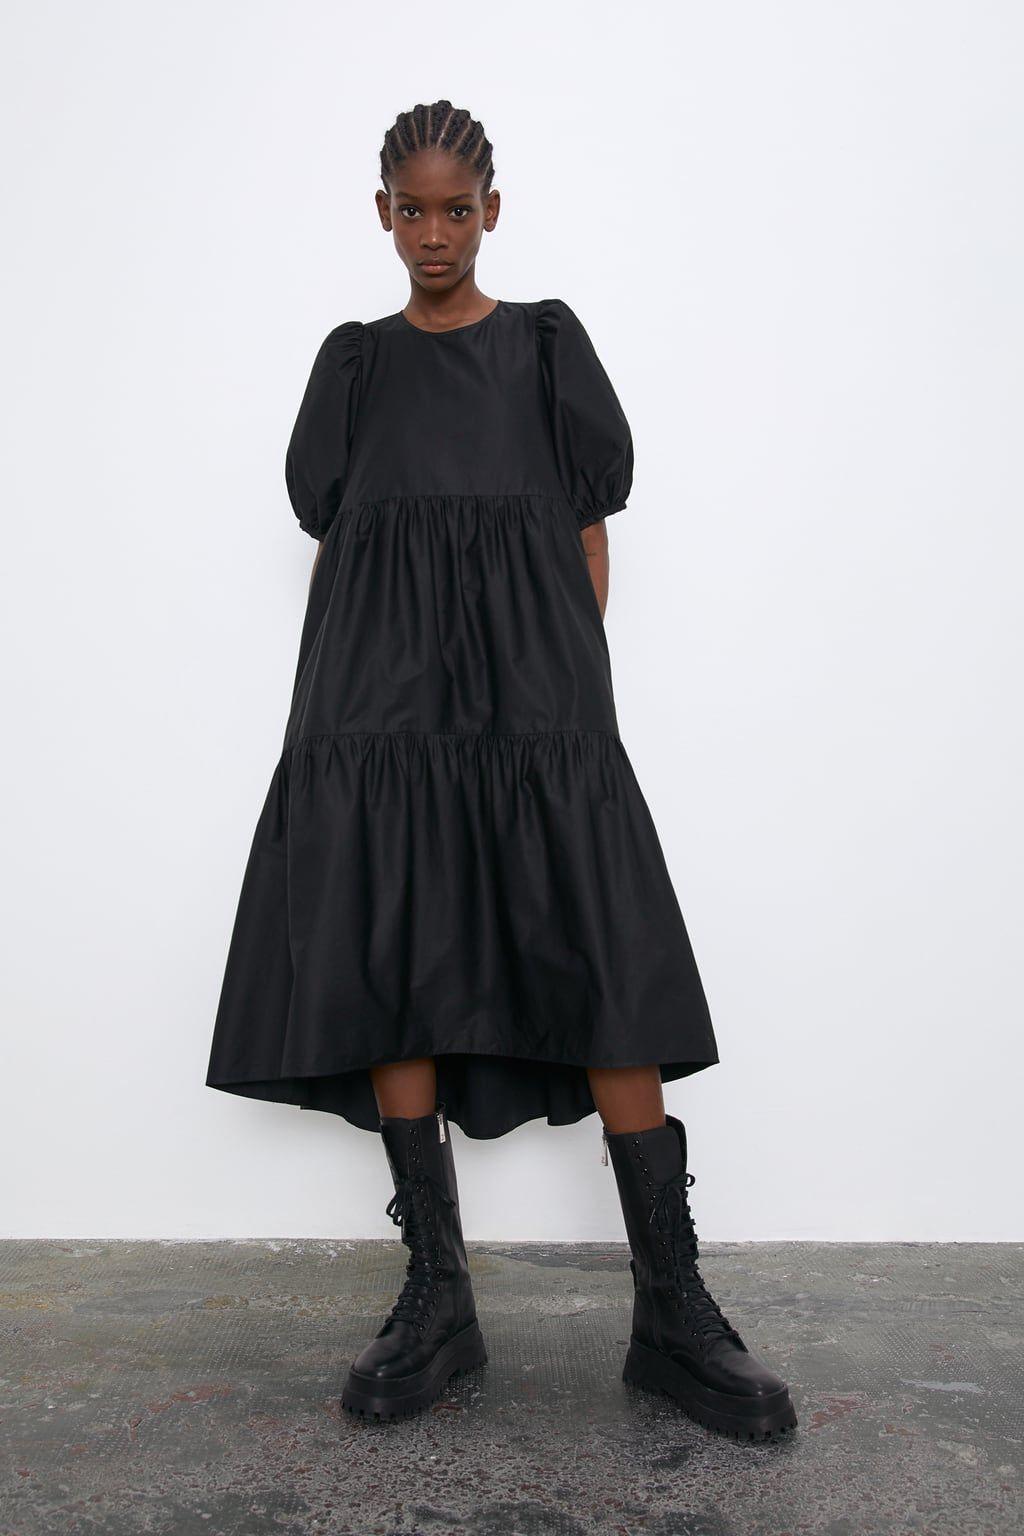 VESTIDO ASIMÉTRICO POPELÍN  Zara woman dress, Fashion, Poplin dress